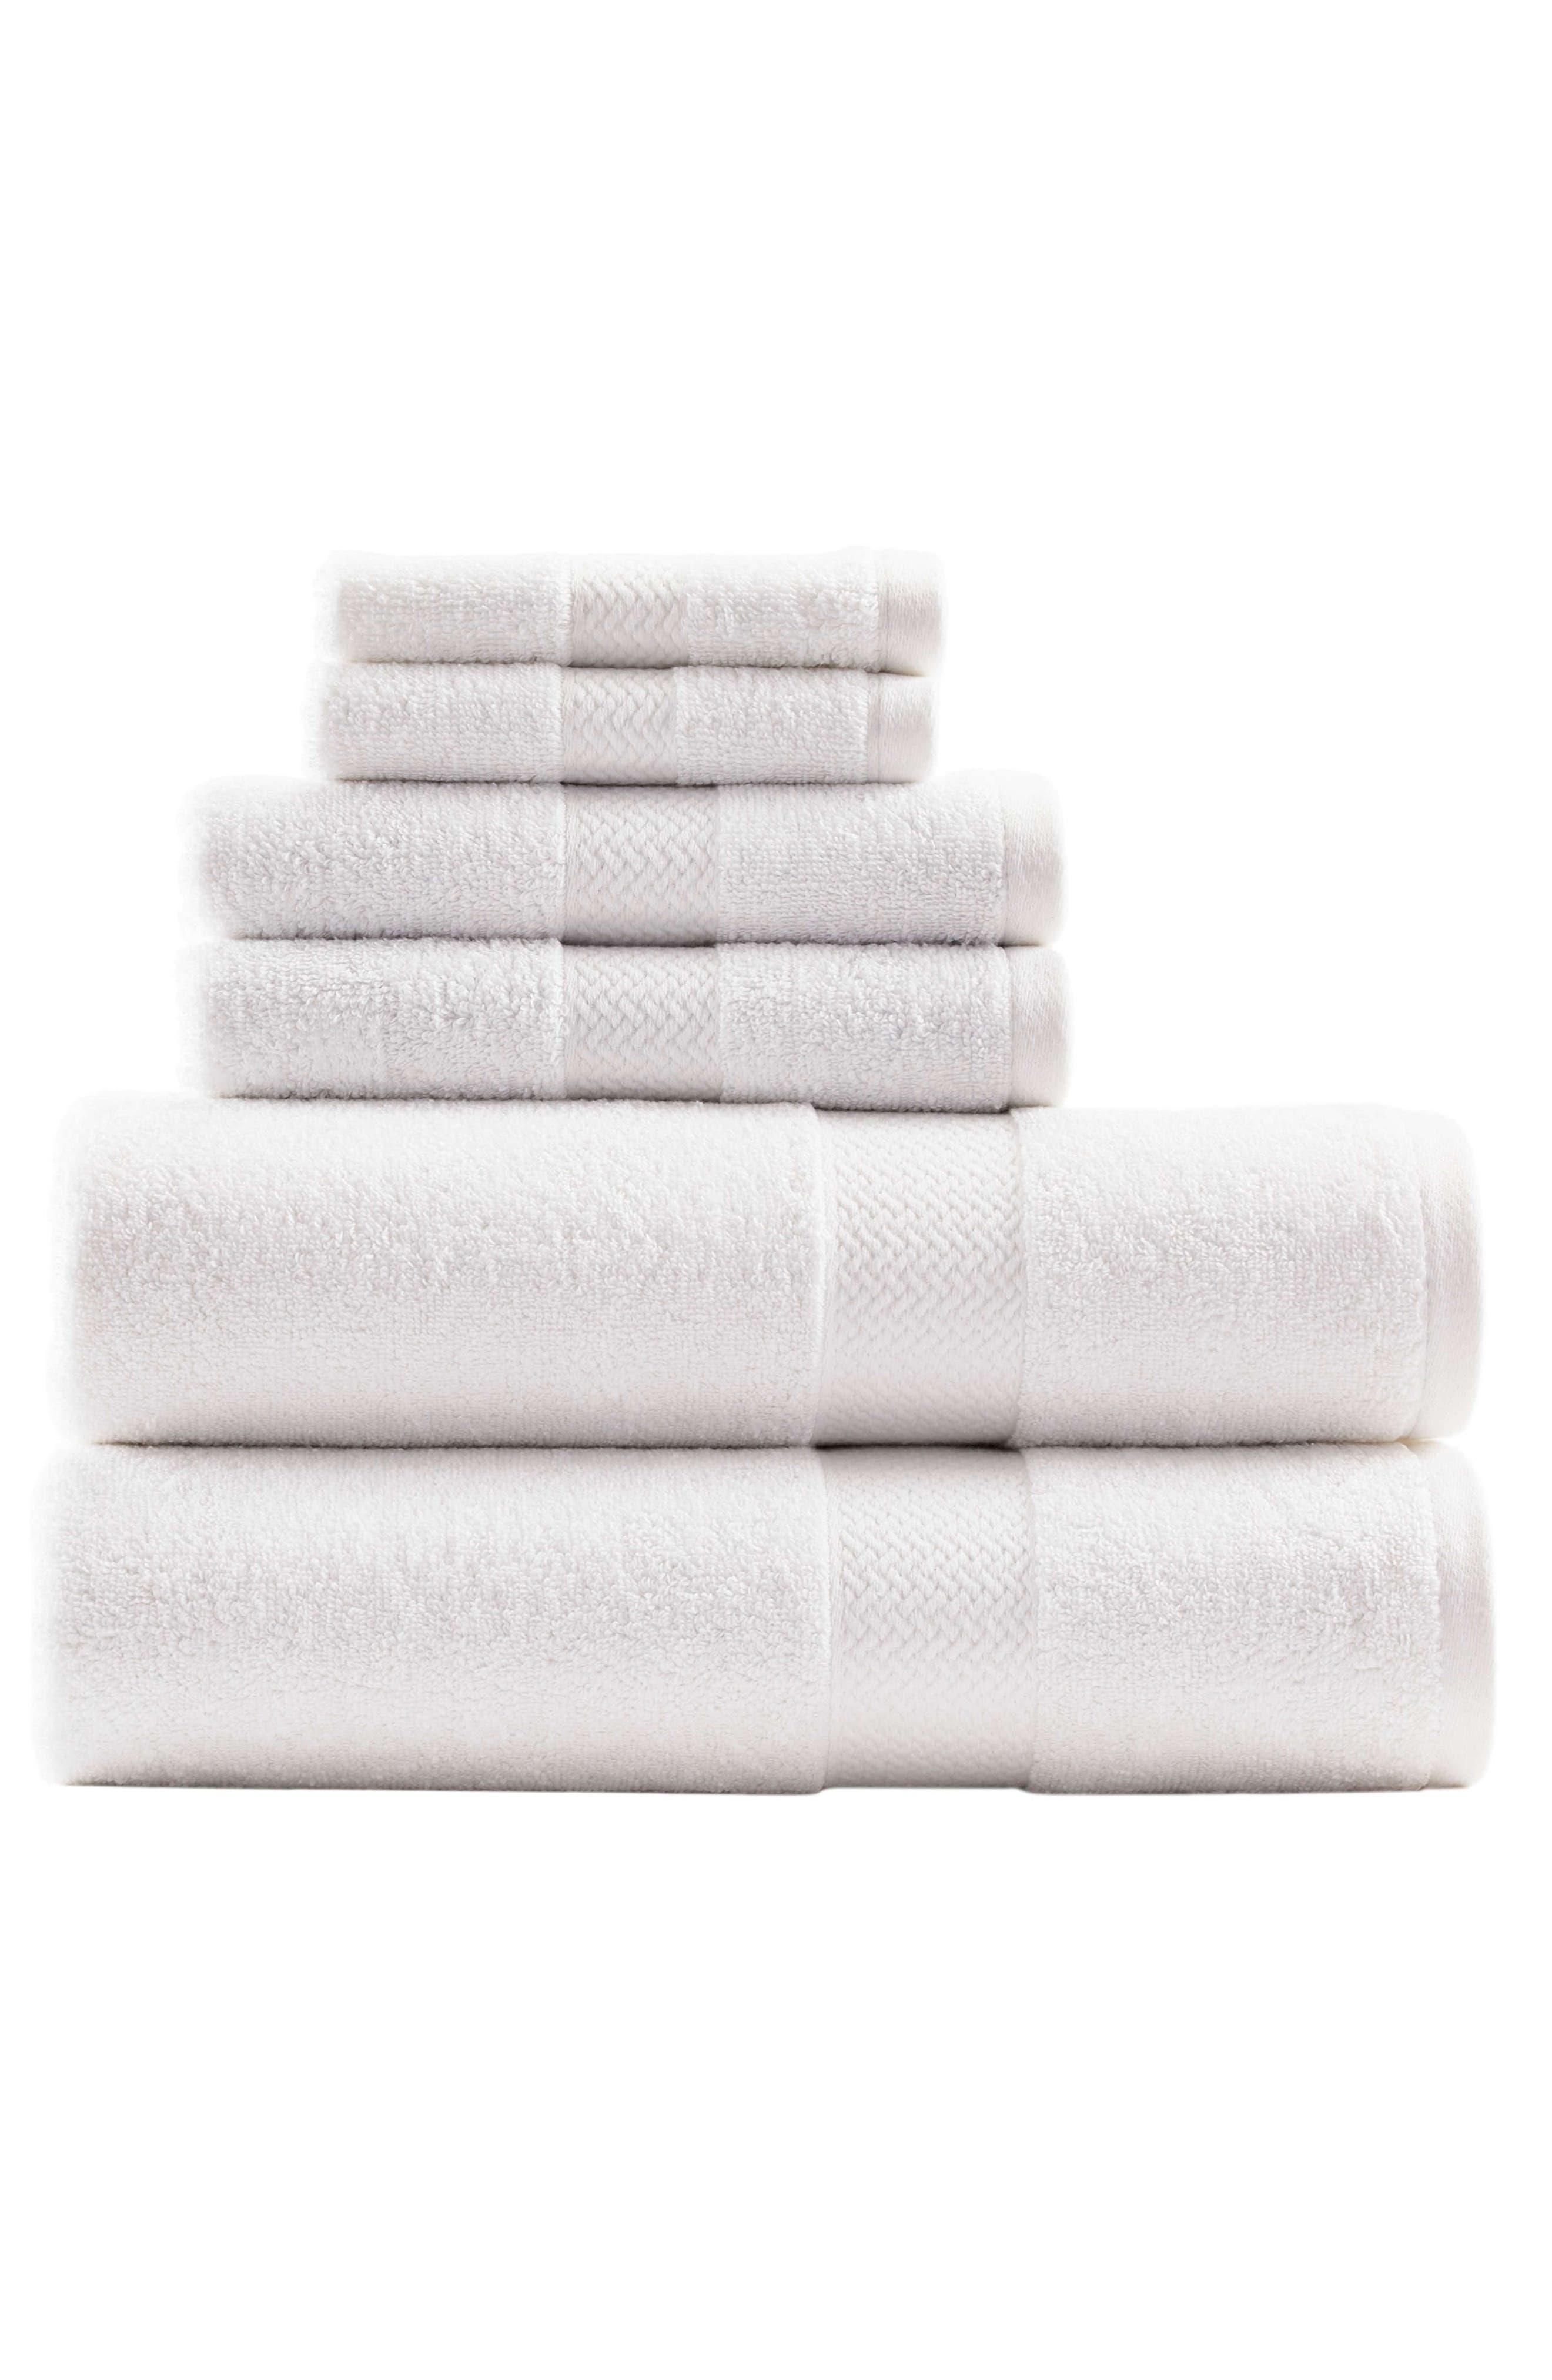 Cypress Bay 6-Piece Towel Set,                             Main thumbnail 1, color,                             WHITE